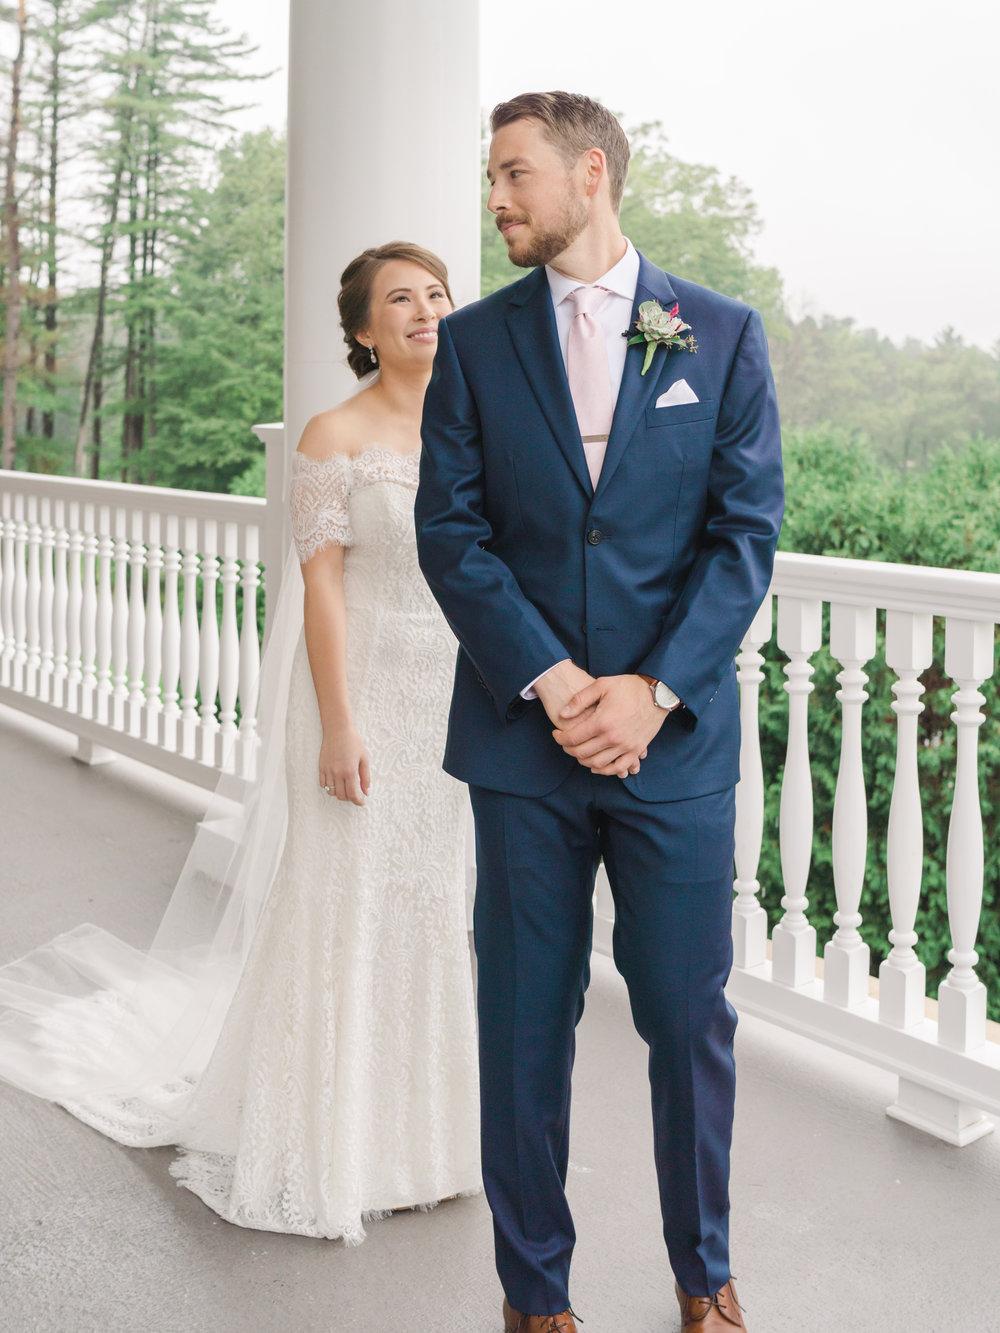 hannah-cochran-photography-joe-and-susan-wedding-48.jpg